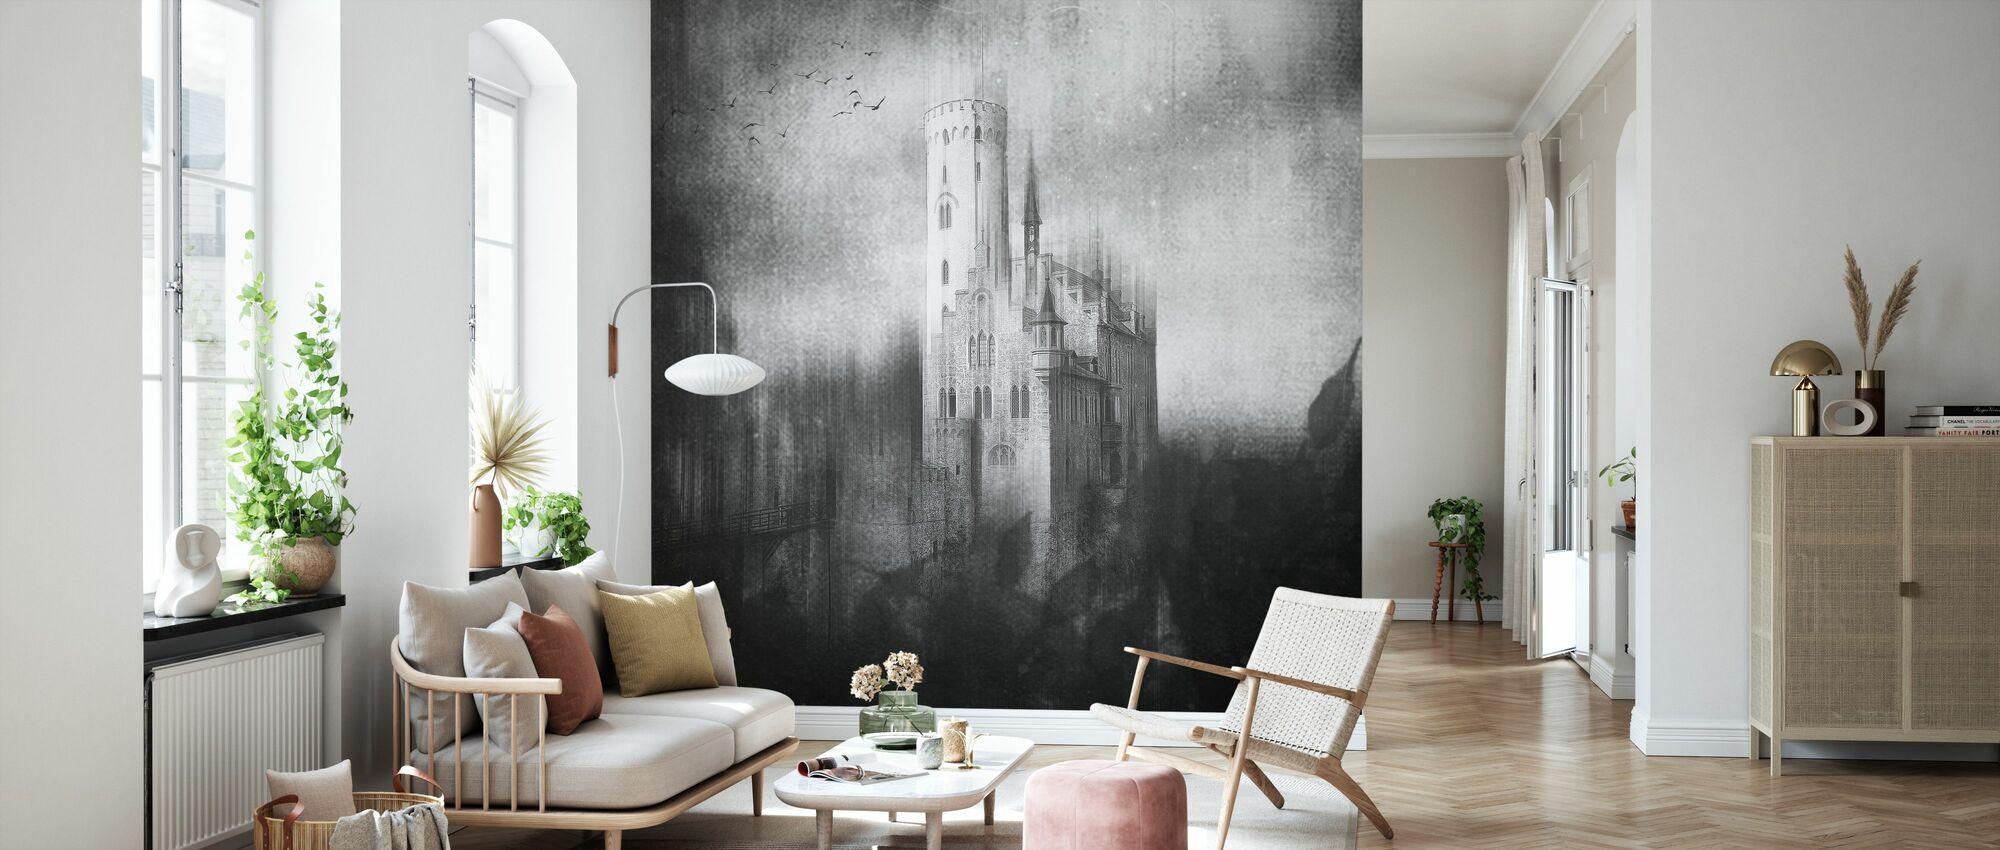 Lichtenstein Castle - Wallpaper - Living Room